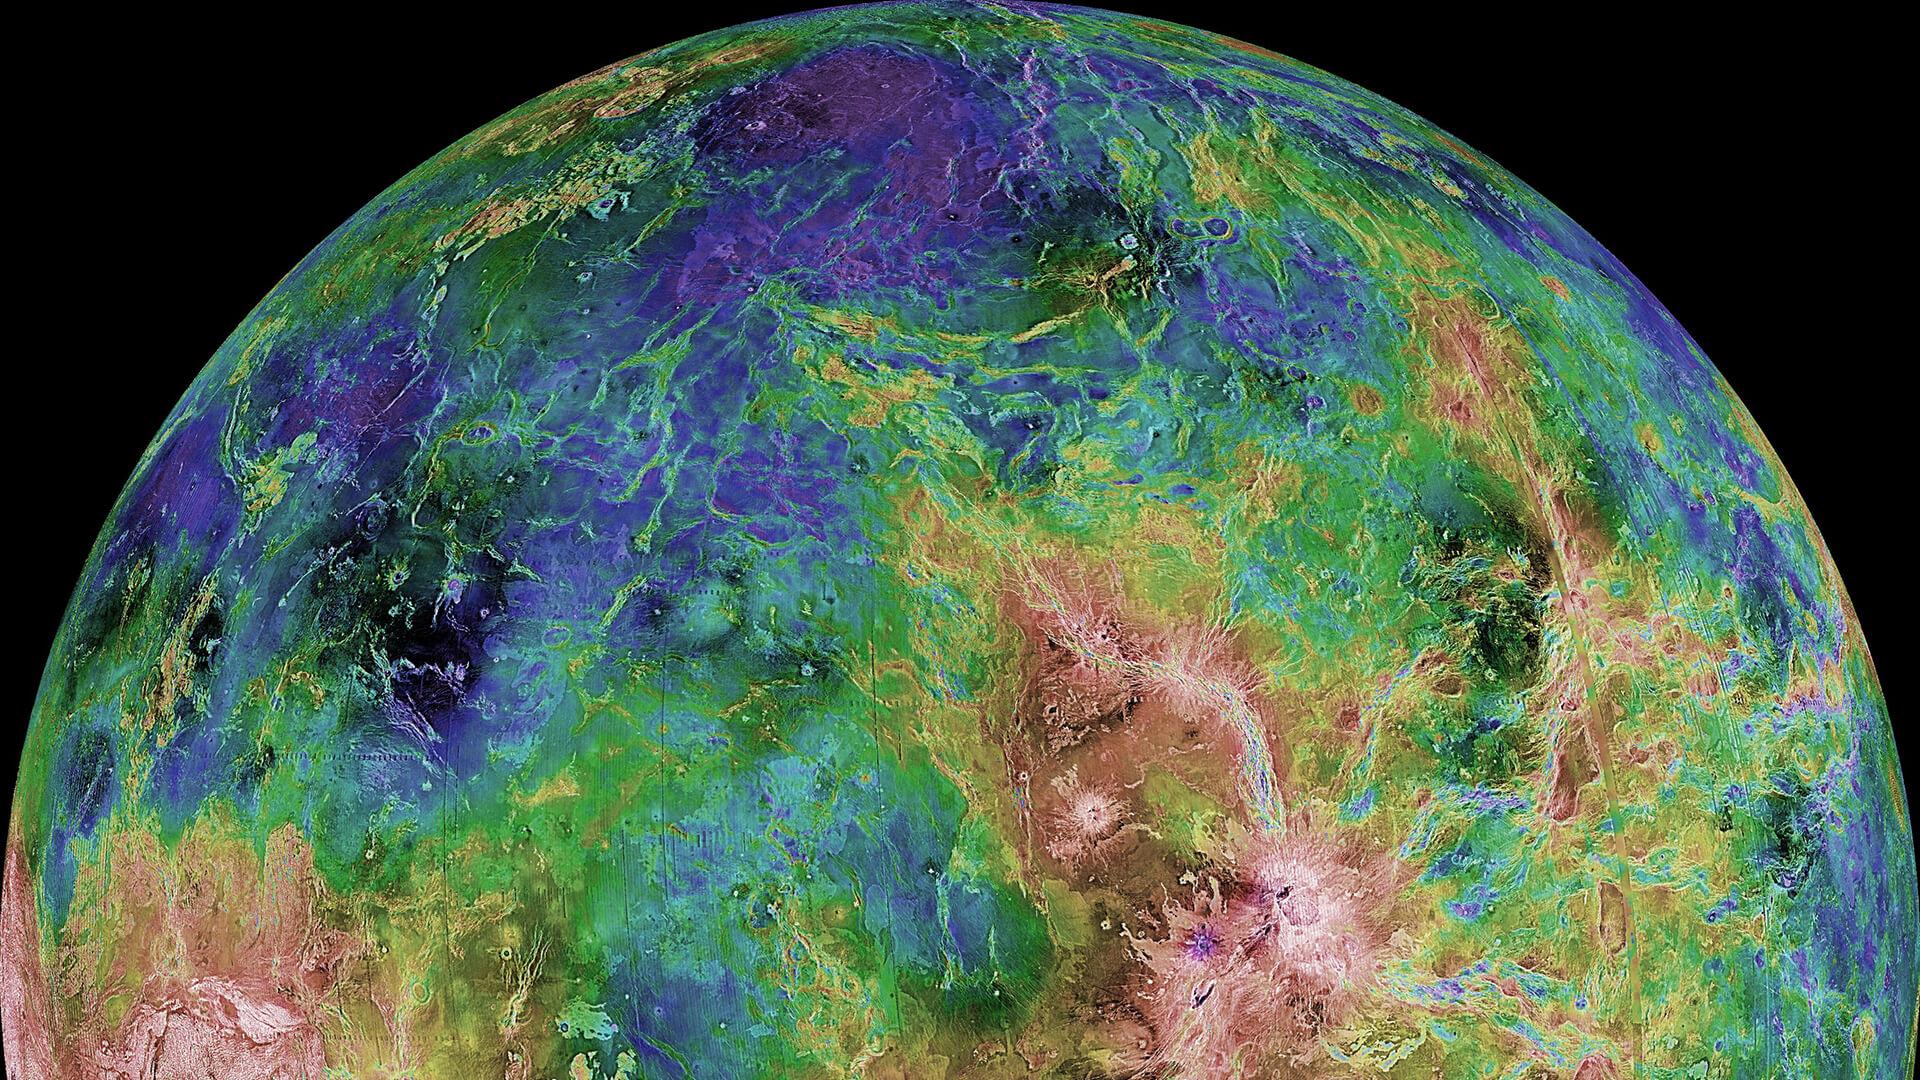 venus-planet-space-nasaimage-1920